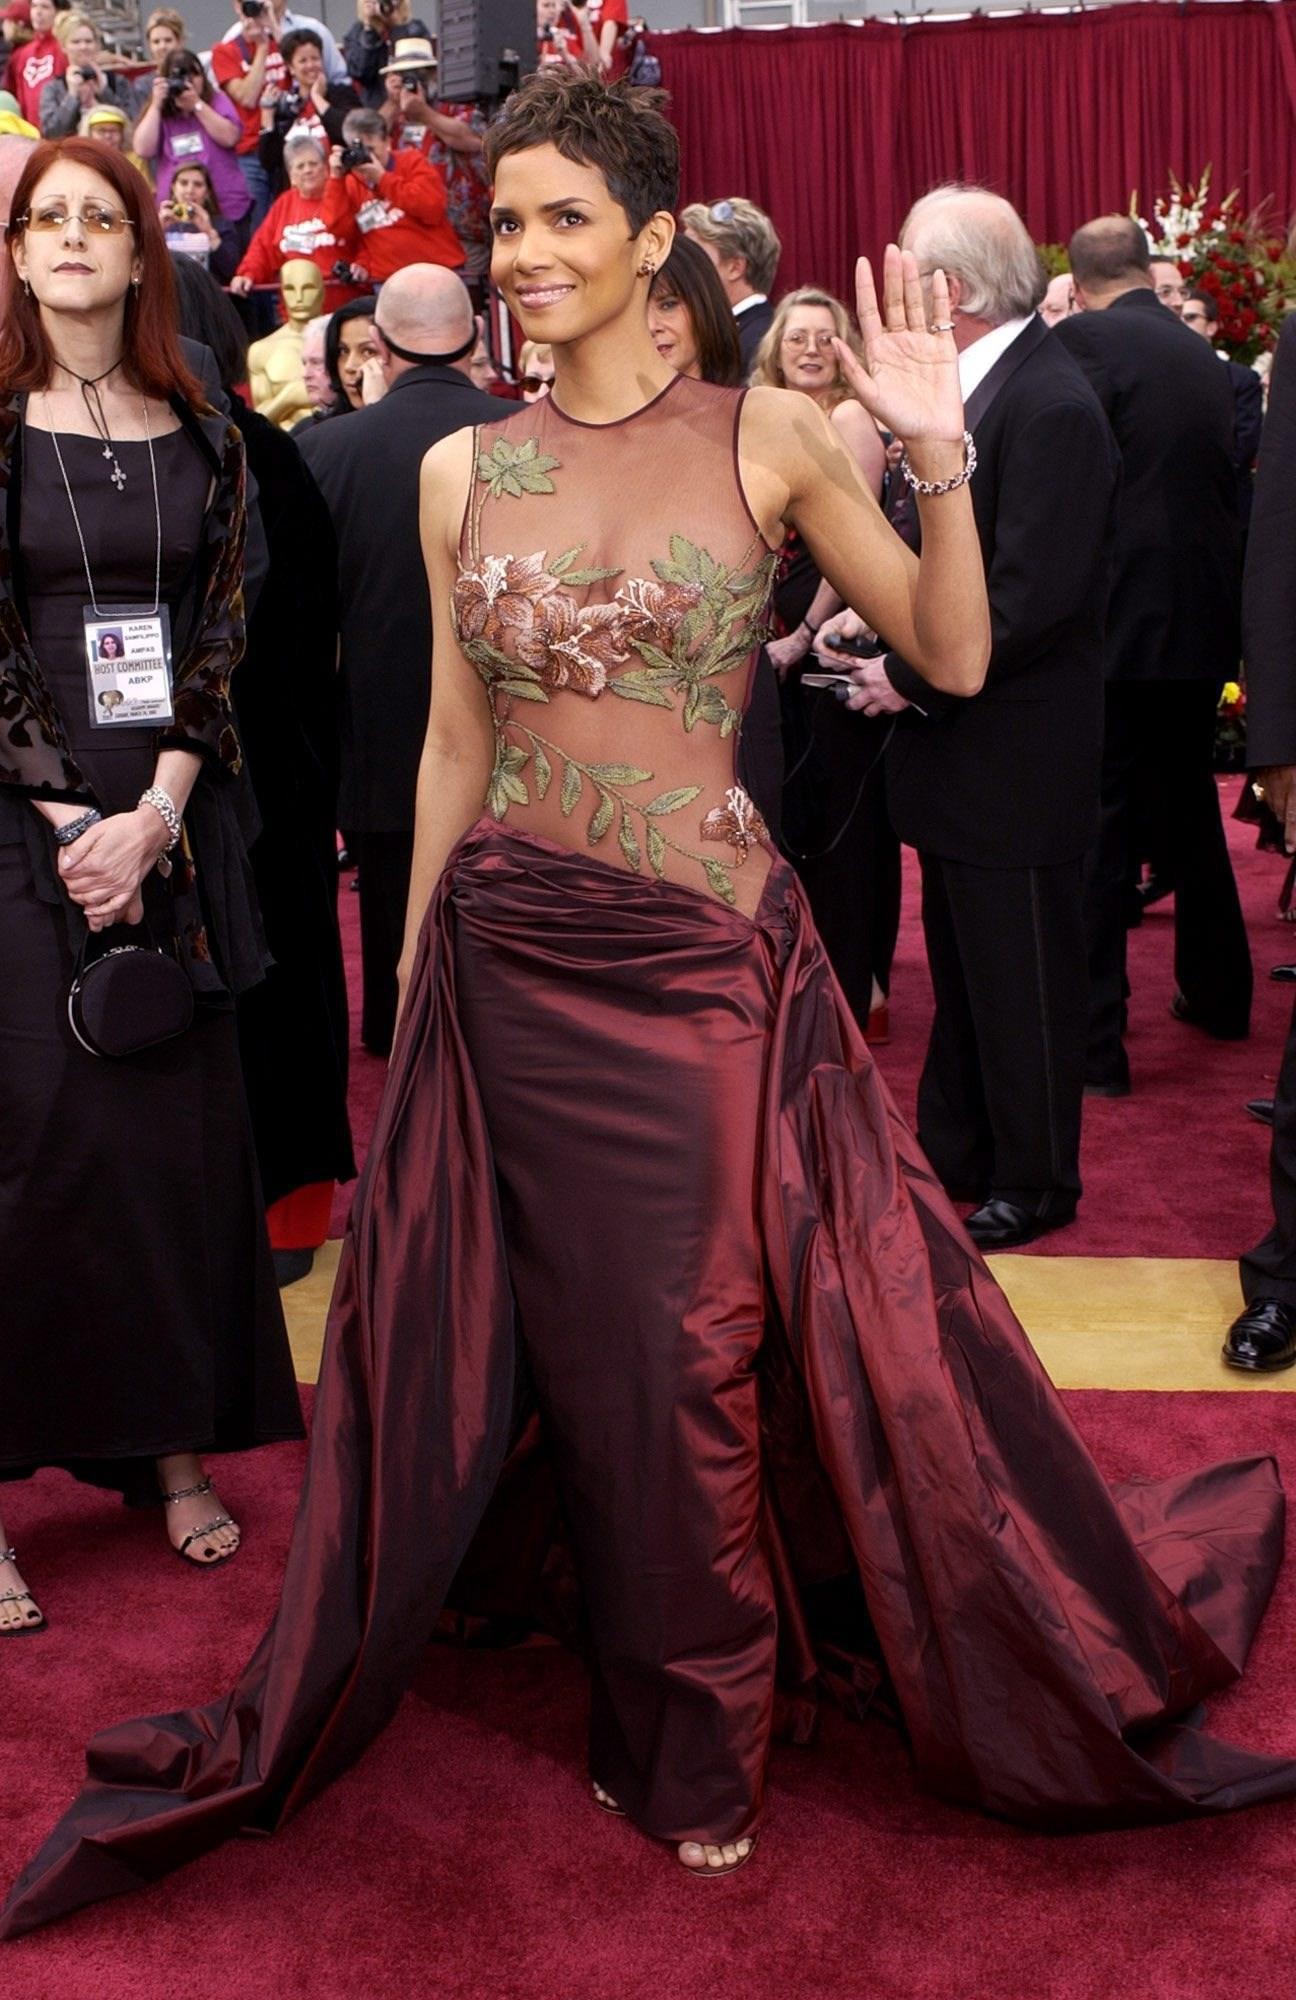 halle berry wearing a maroon dress